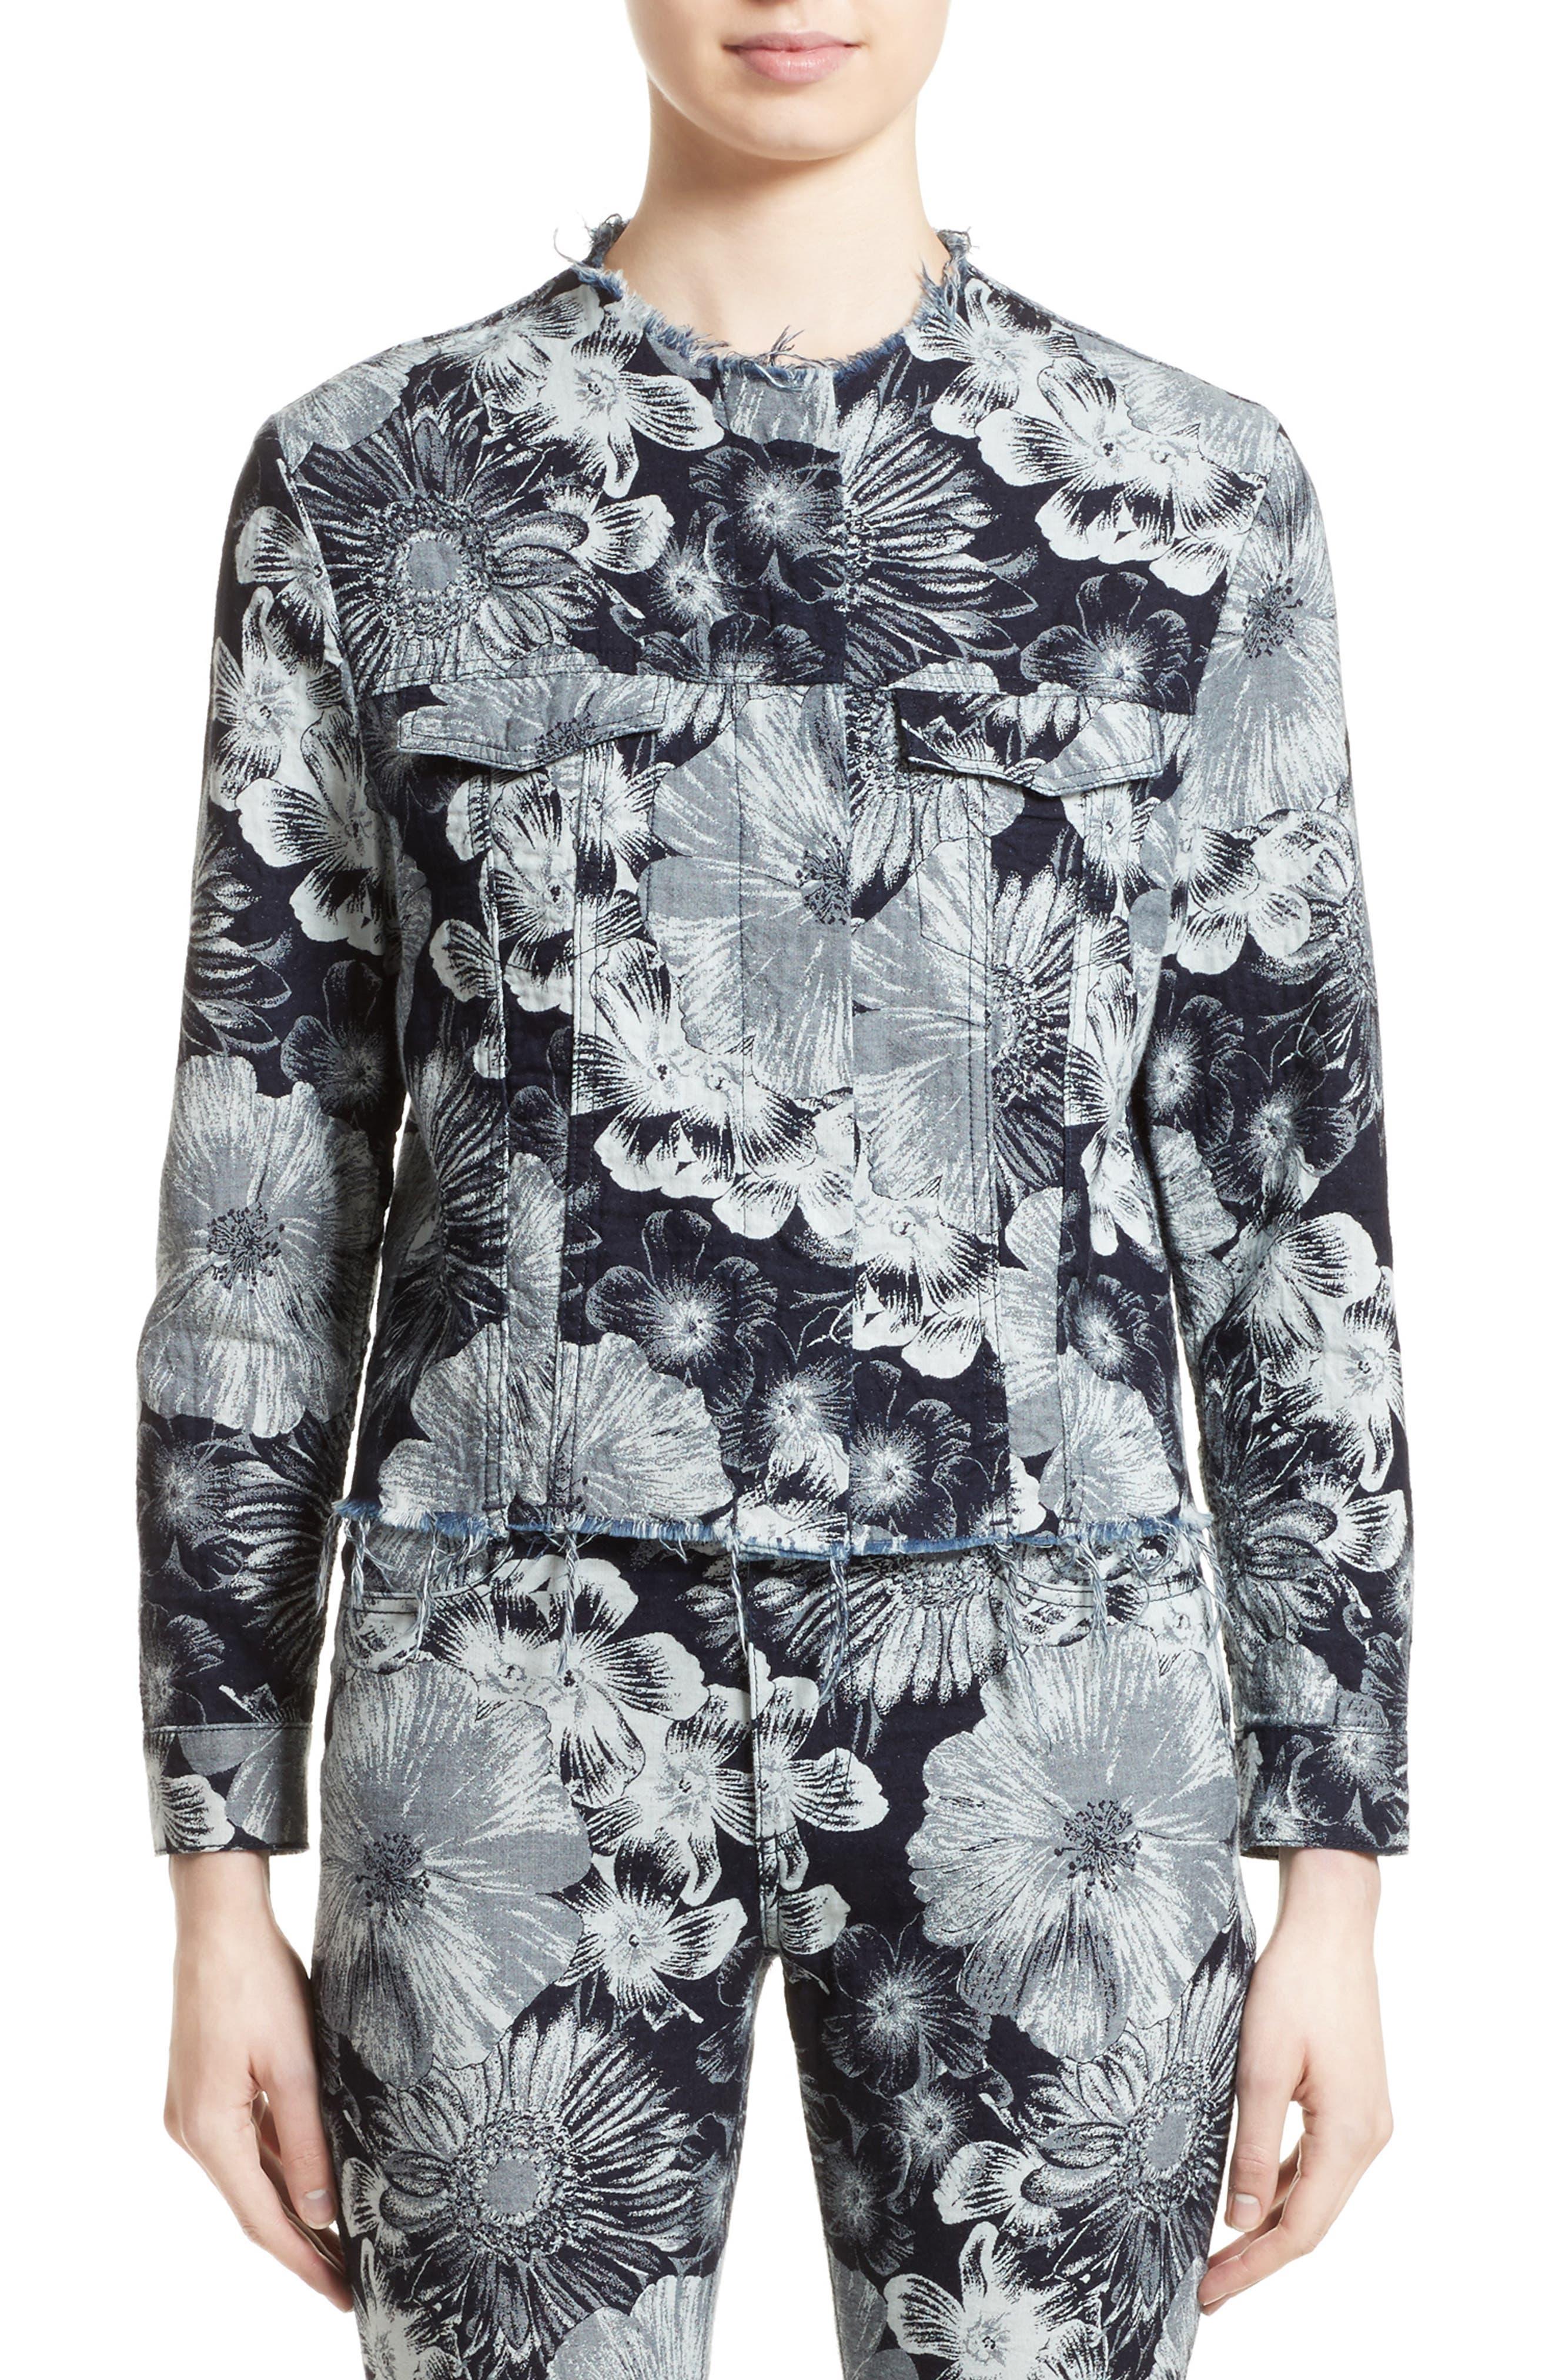 Marques'Almeida Floral Print Classic Fitted Denim Jacket,                         Main,                         color, Indigo Floral